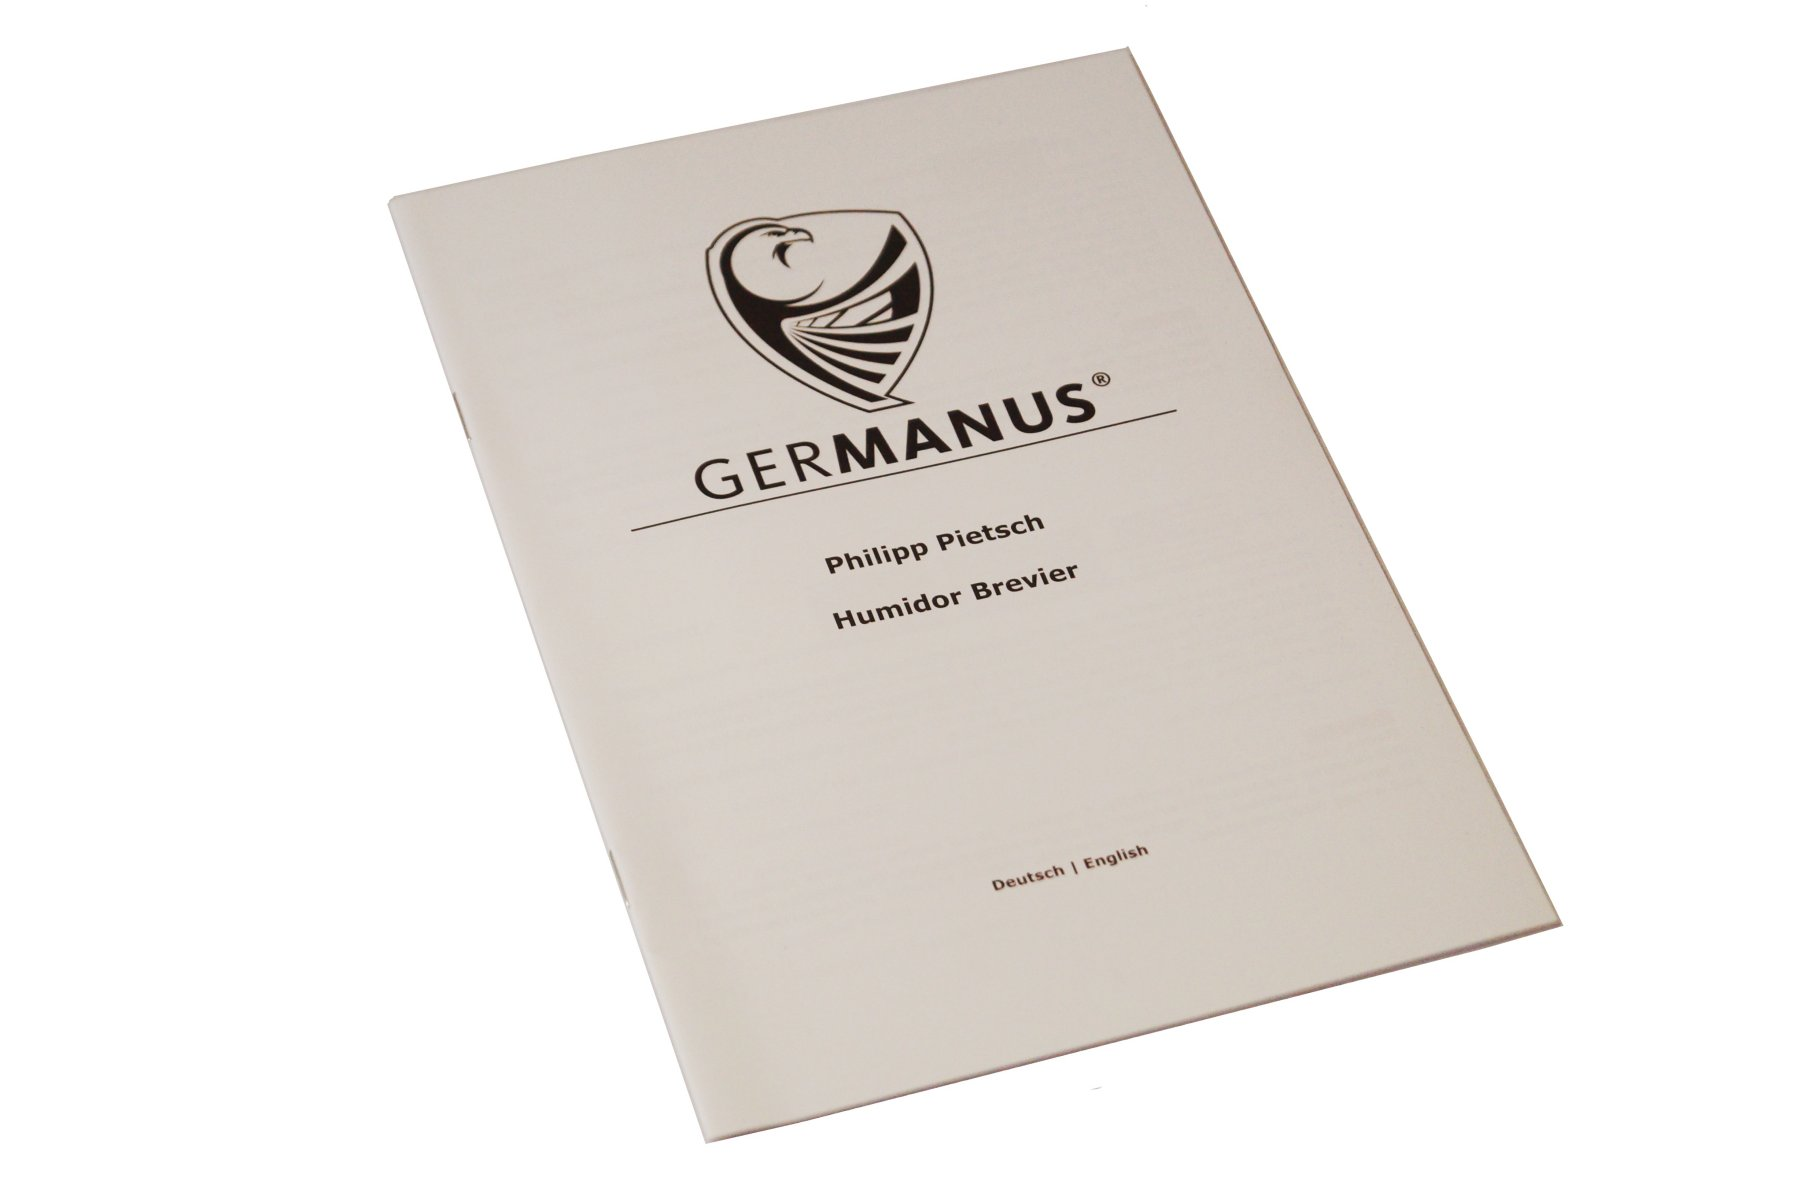 Humidor Einrichten humidor setup germanus